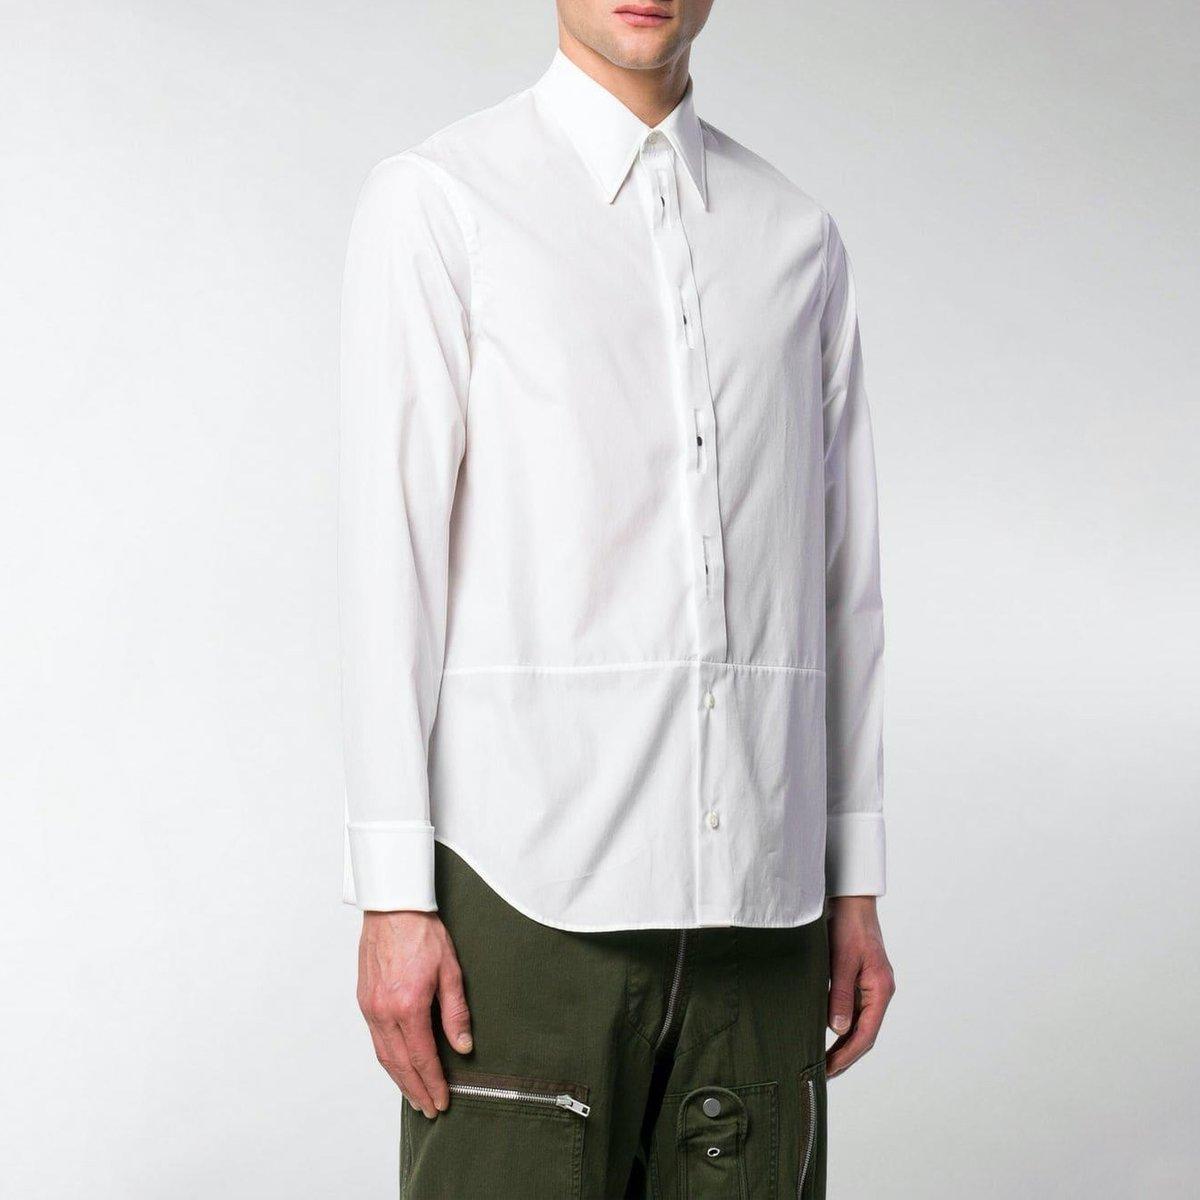 maison-martin-margiela-100-WHITE-Concealed-Button-Shirt (2).jpg